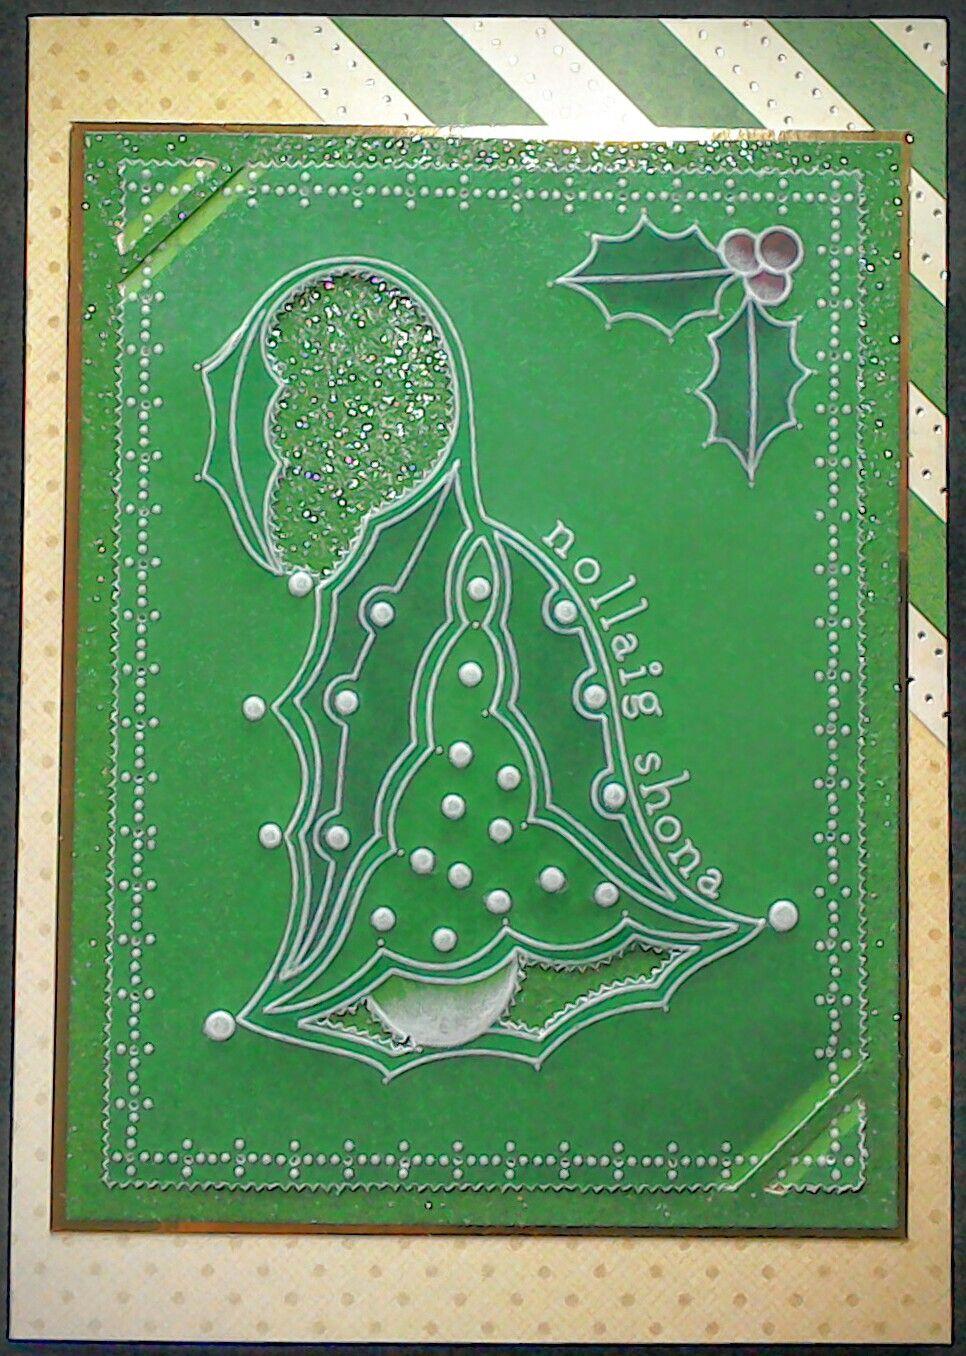 Clarity Groovi Plates Irish Christmas card by Lynne Lee | Clarity ...